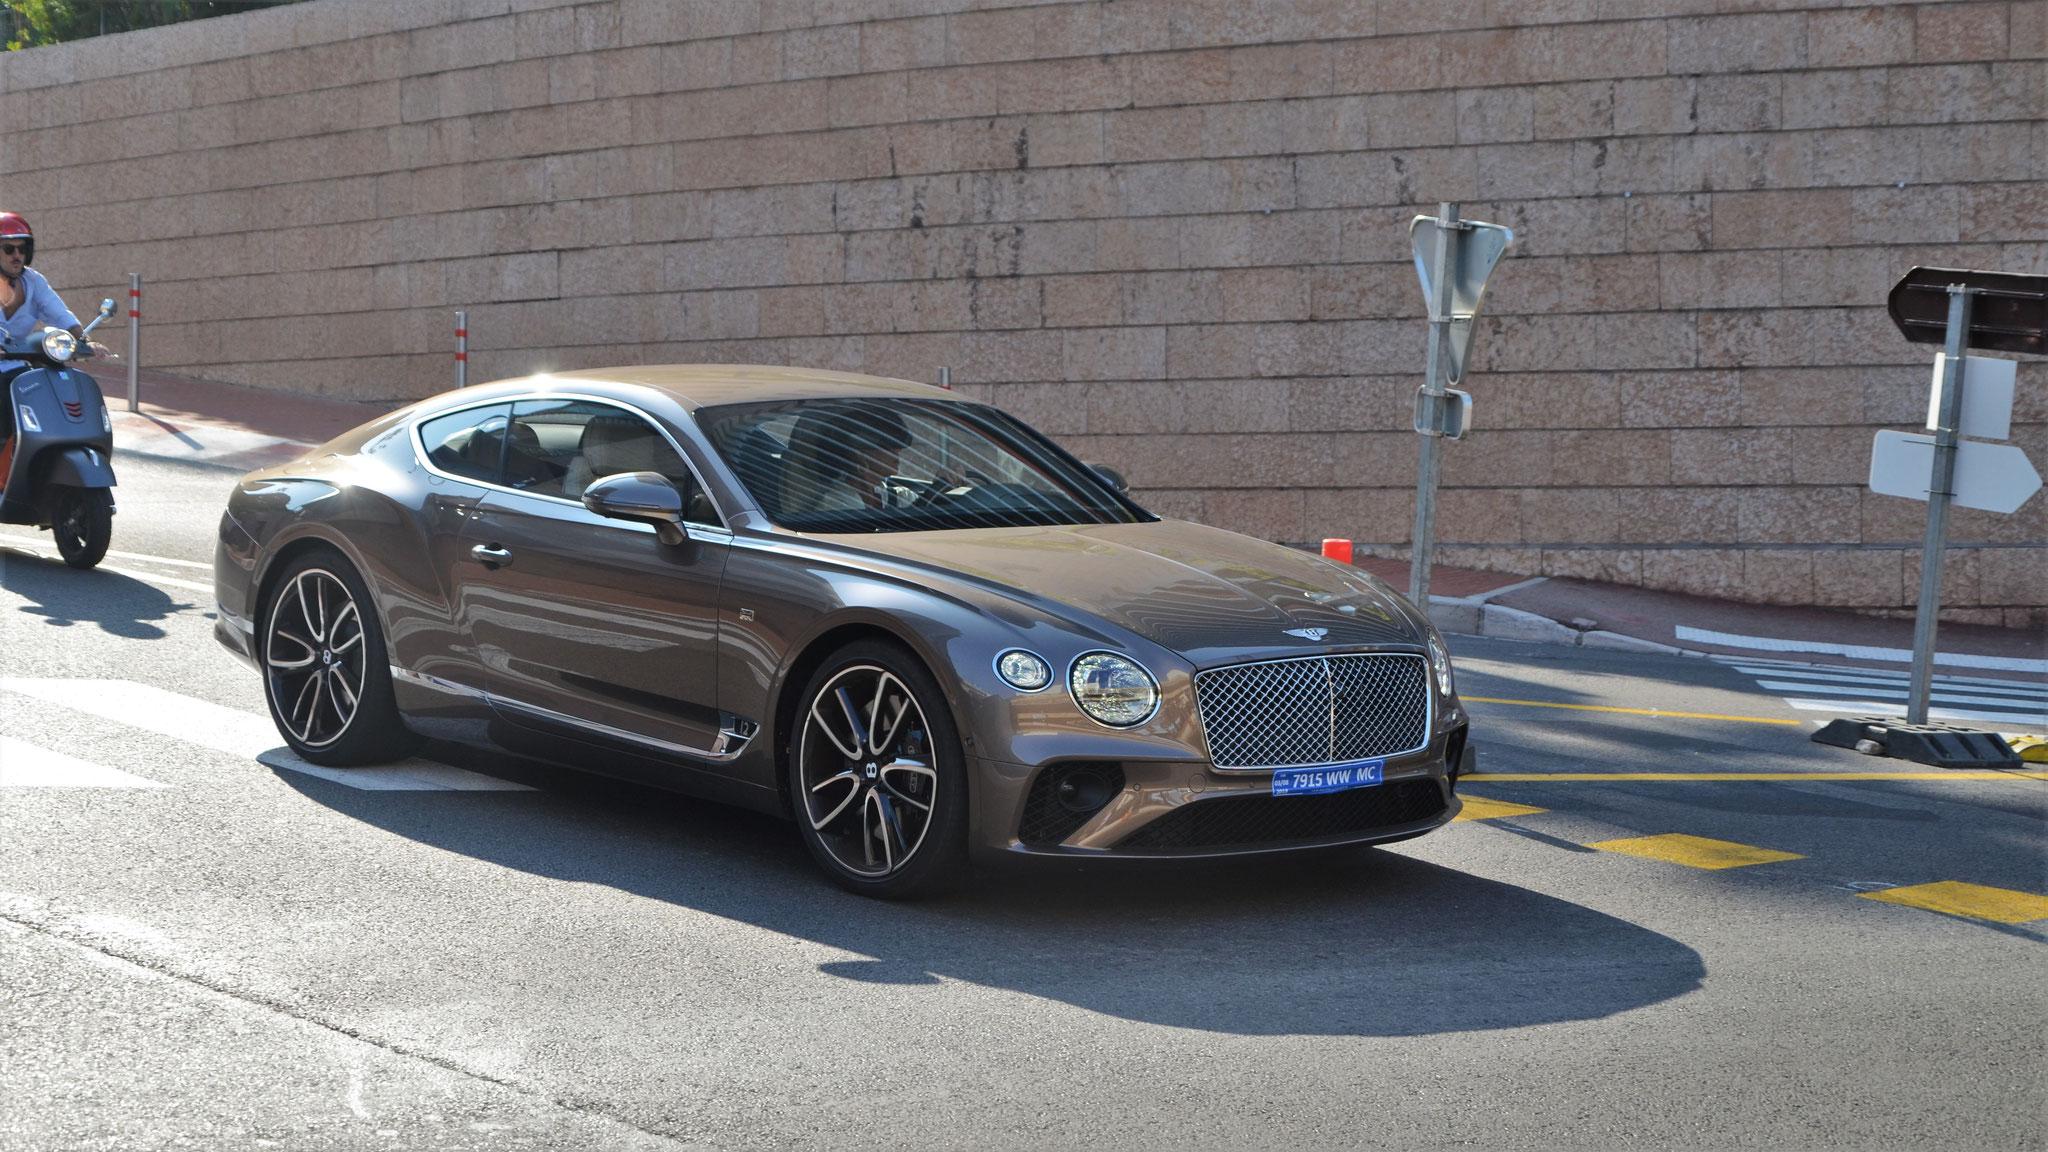 Bentley Continental GT - 7915-WW-MC (MC)